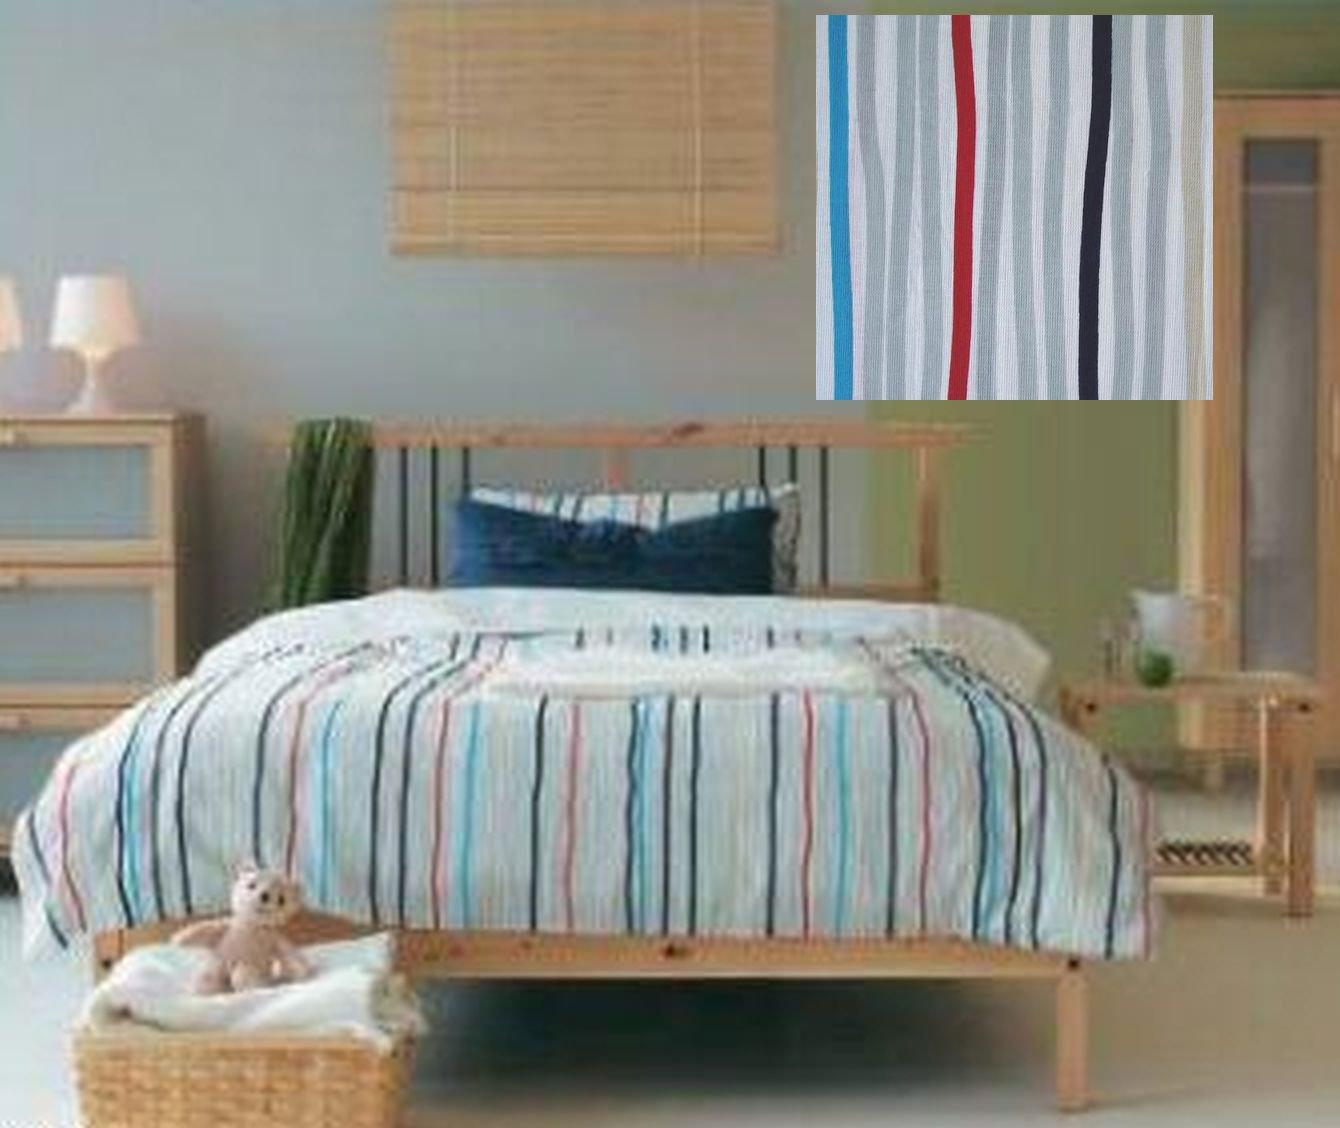 IKEA Tove QUEEN Full Double Duvet COVER Pillowcase Set Stripes Grey Red Blue Beige Scandi Modern